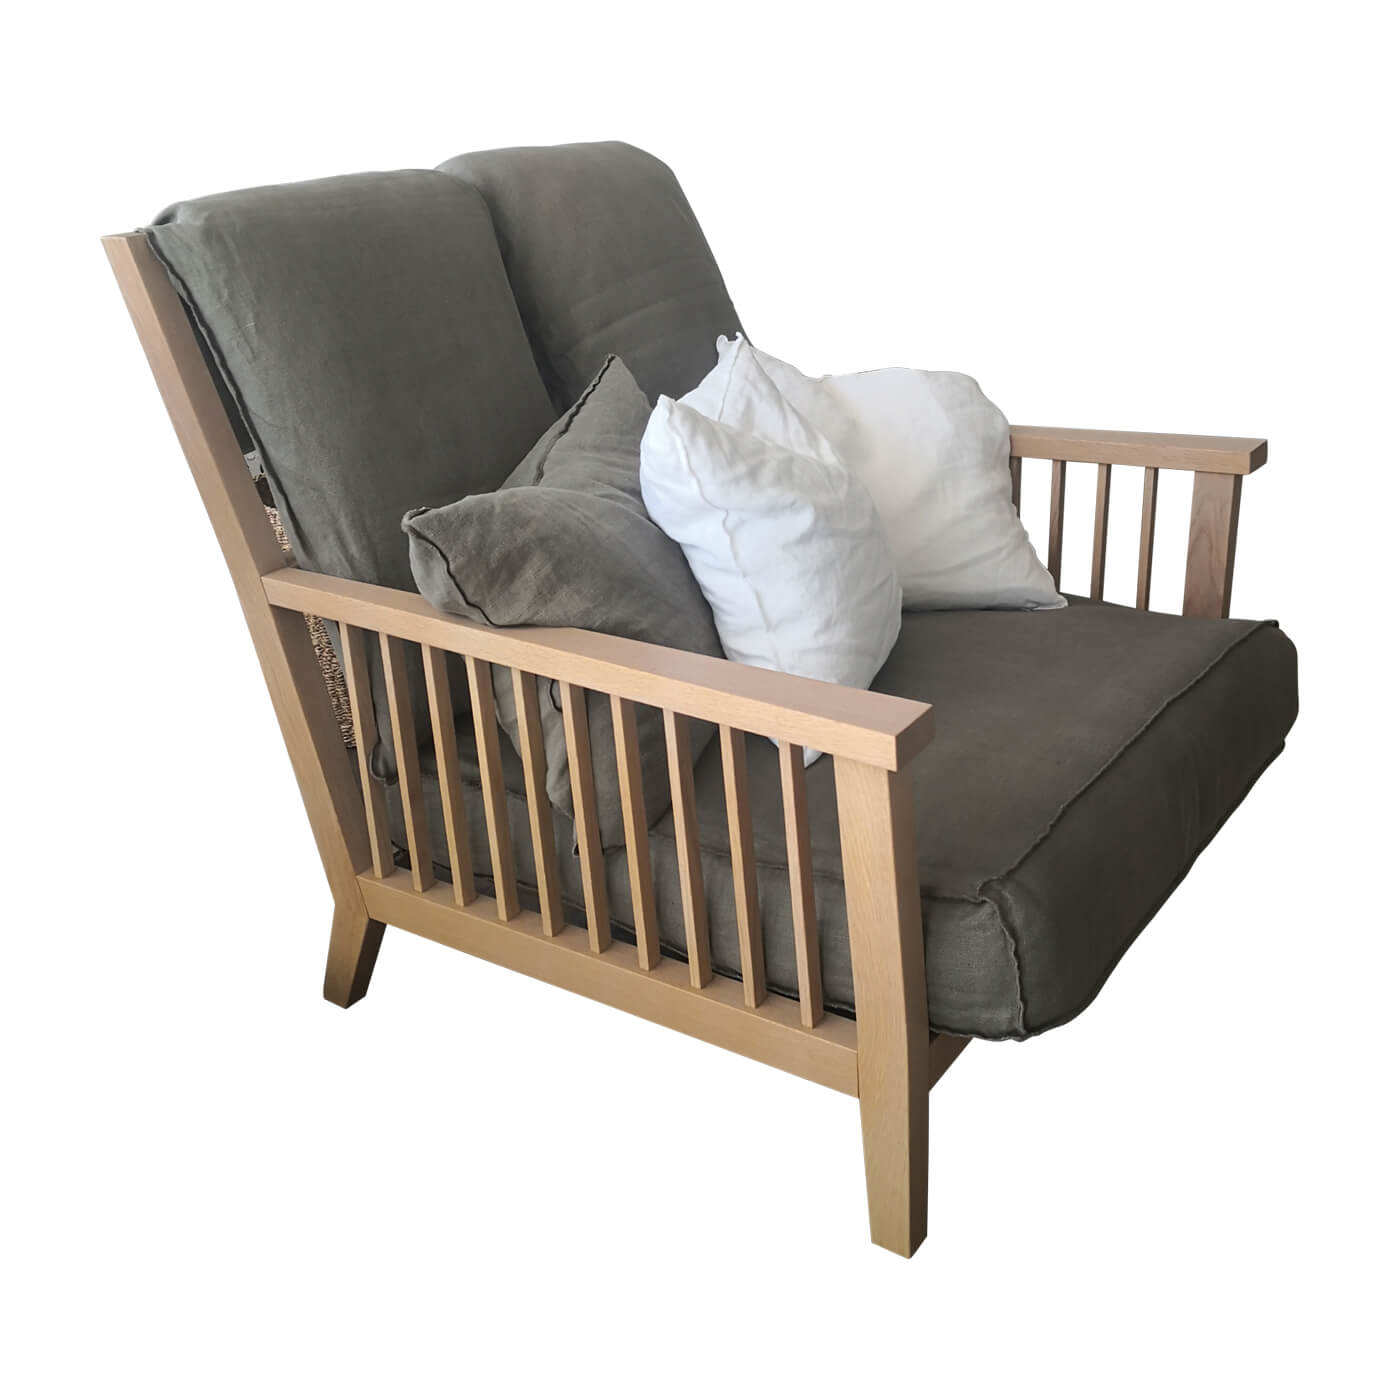 Gervasoni Gray 01 armchair in oak with grey linen cushions